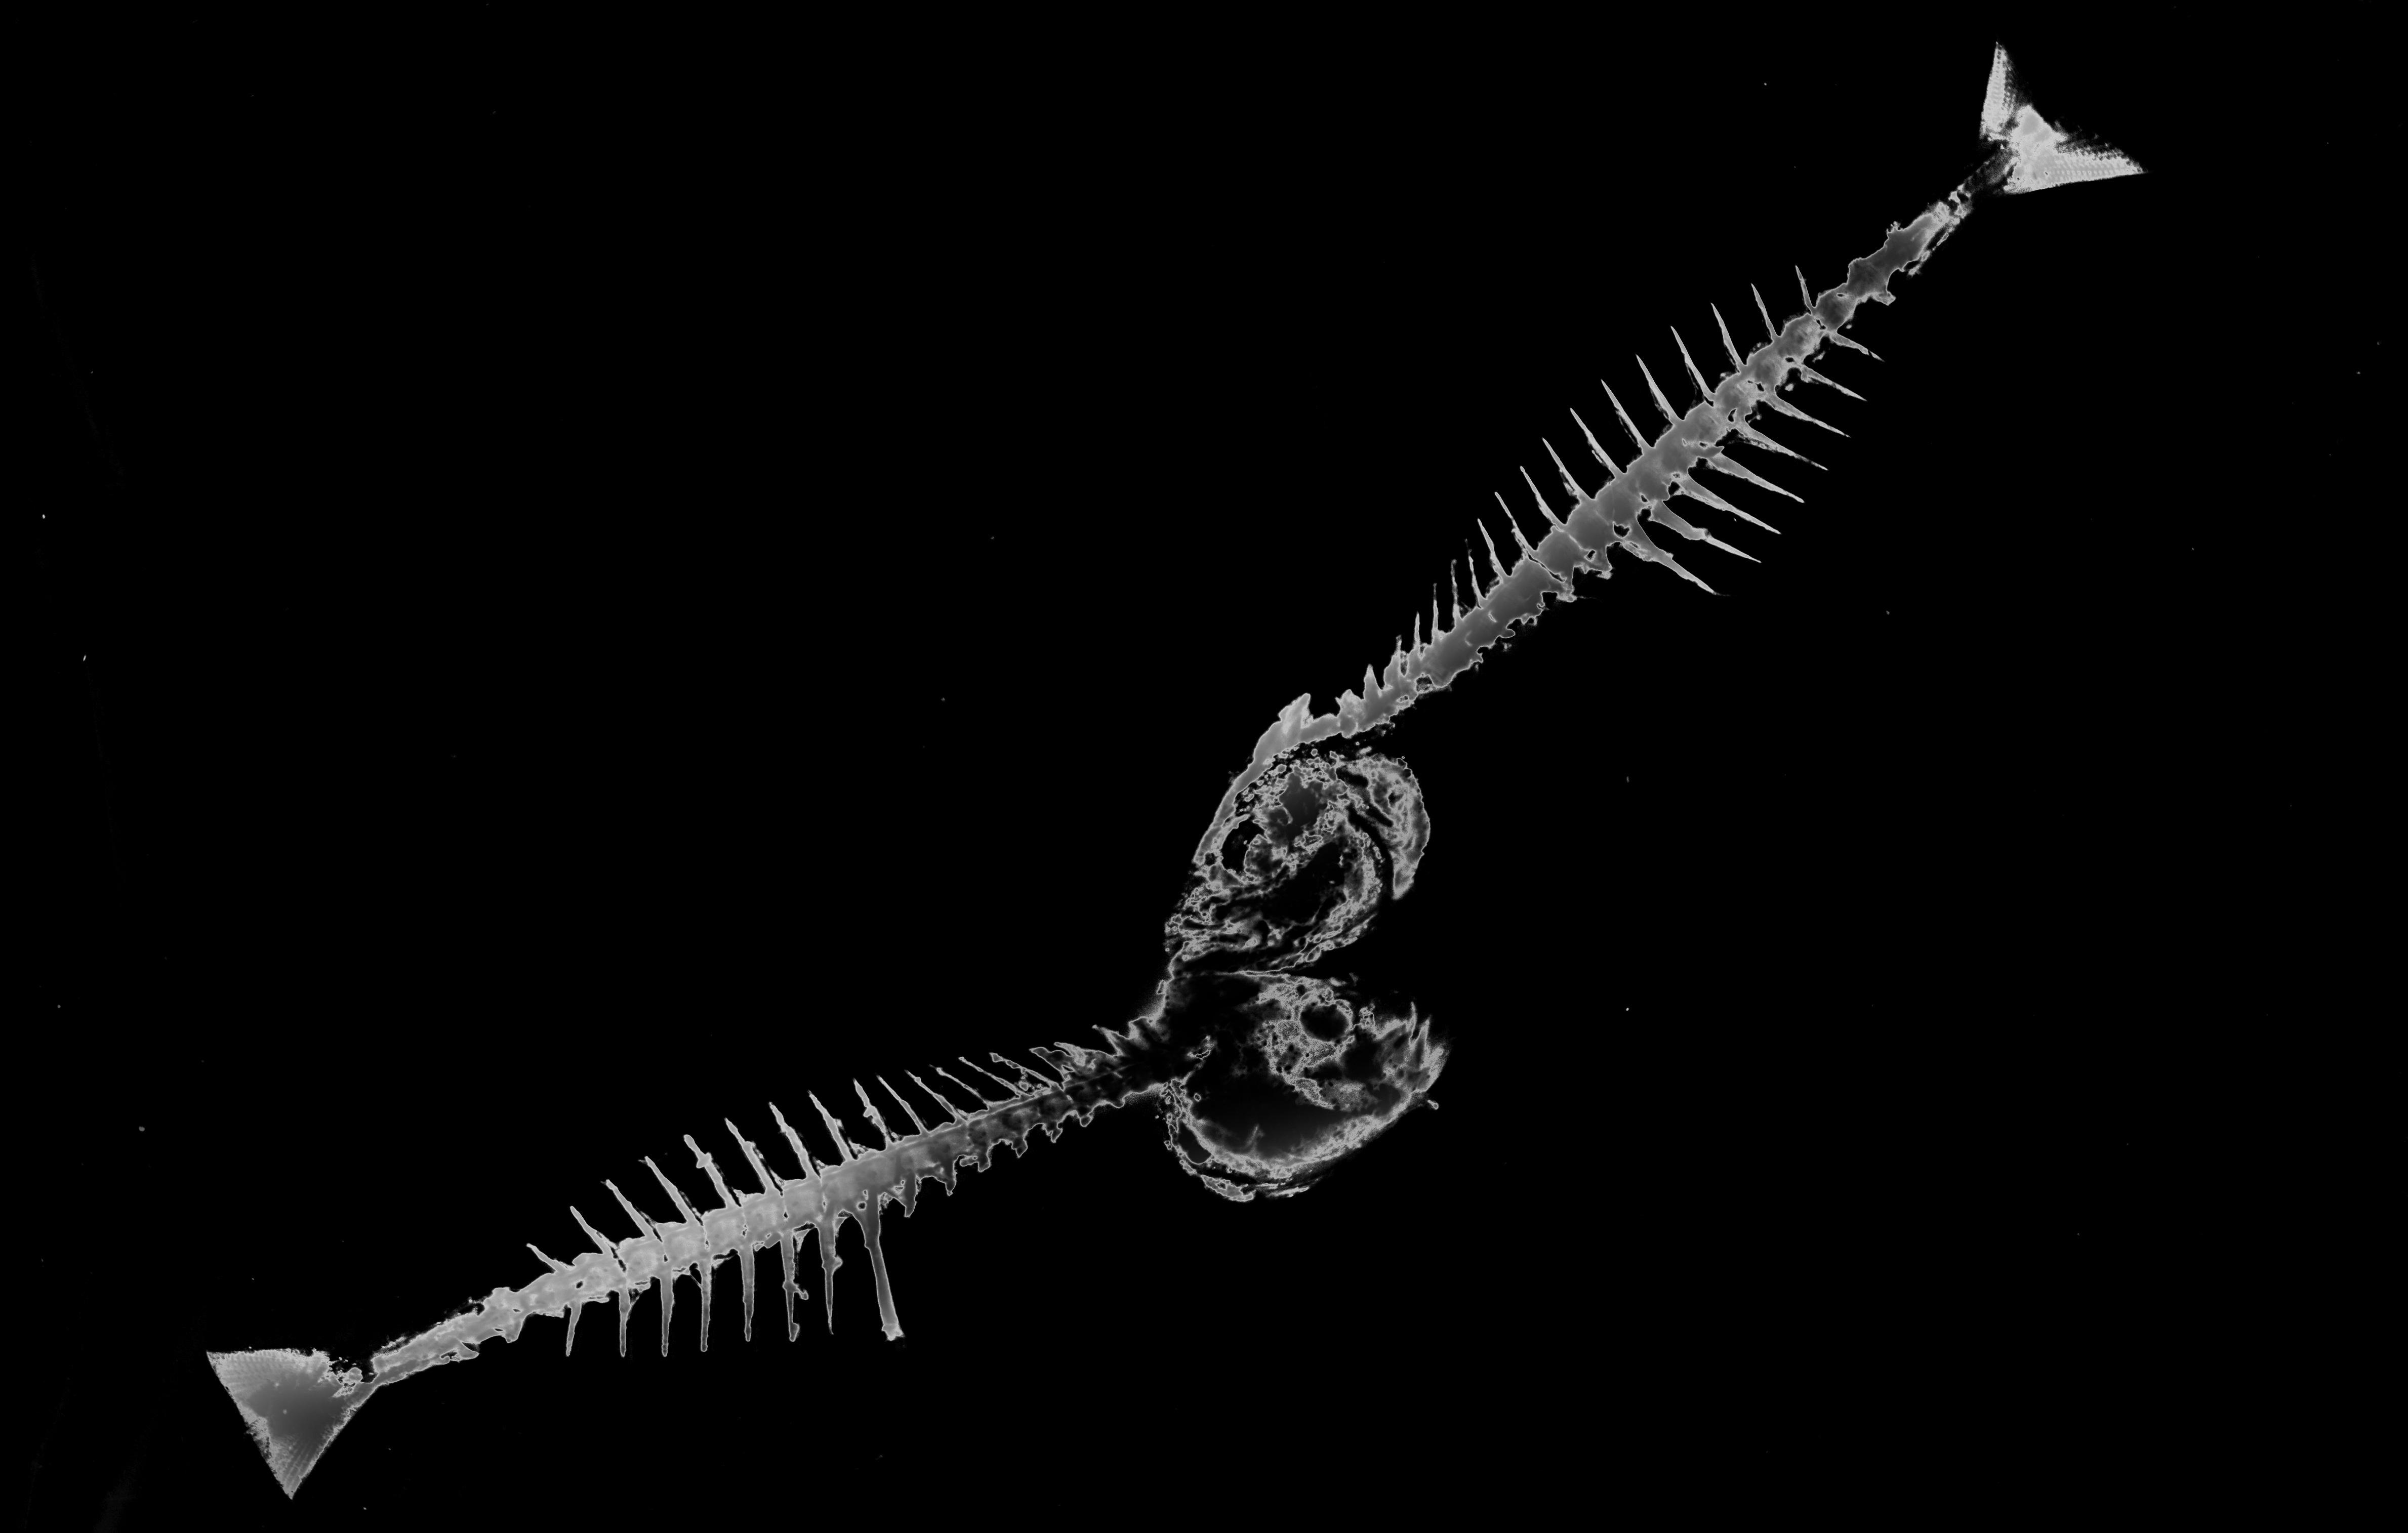 Wing light black and white dark fish bone fine art art monochrome photography deep sea fish